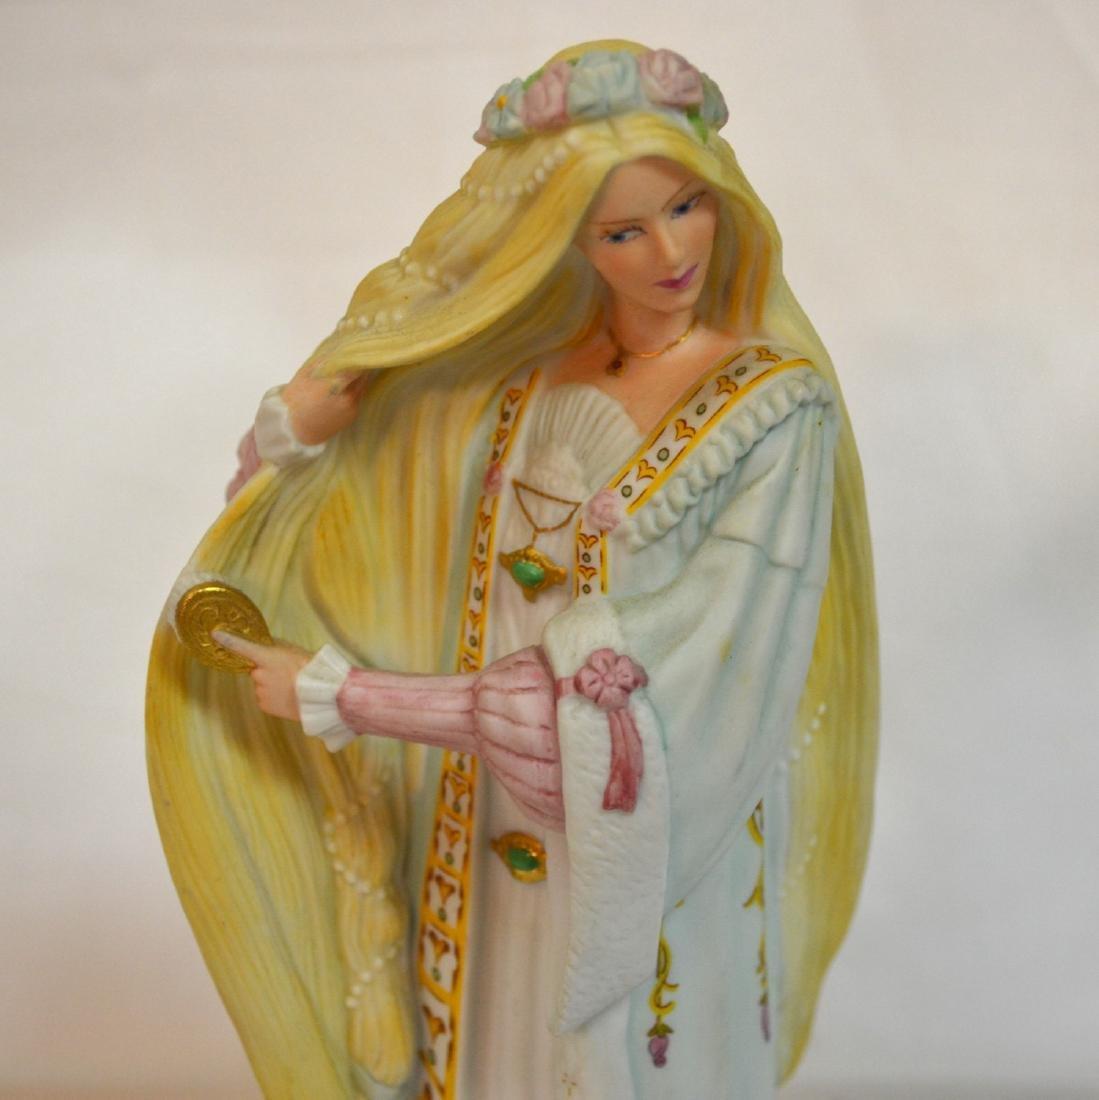 Lenox Legendary Princesses Rapunzel Figurine - 6